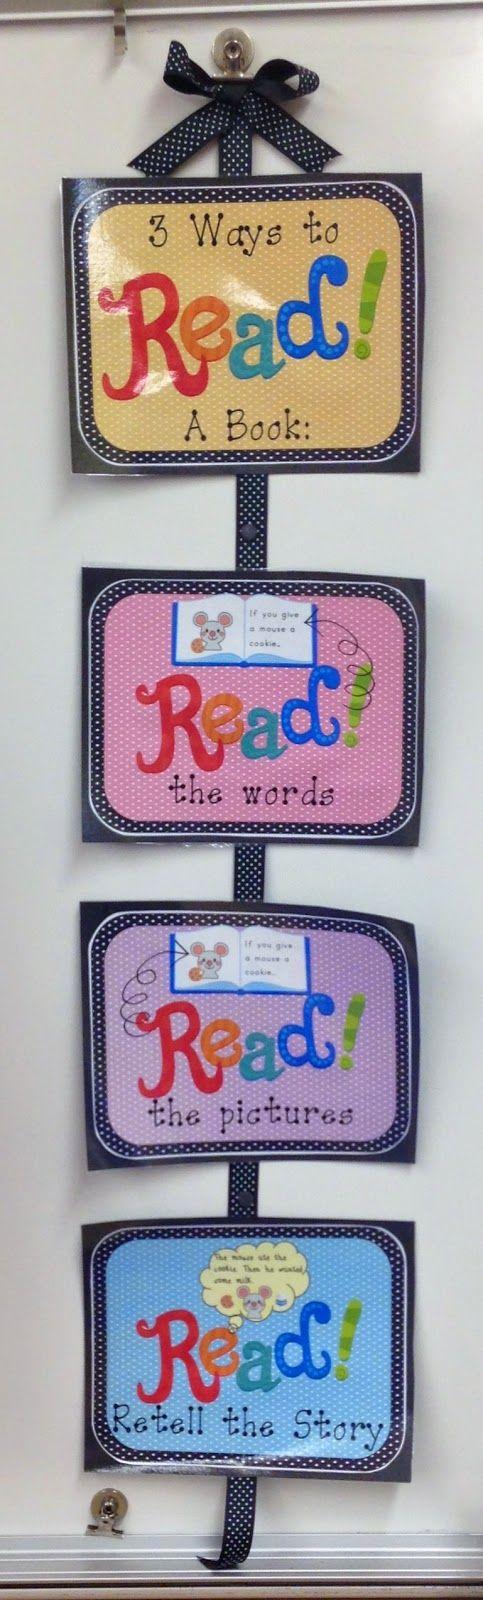 21st Cenutry Kindergarten Blog Post PLUS Daily 5 FREEBIES on TPT!